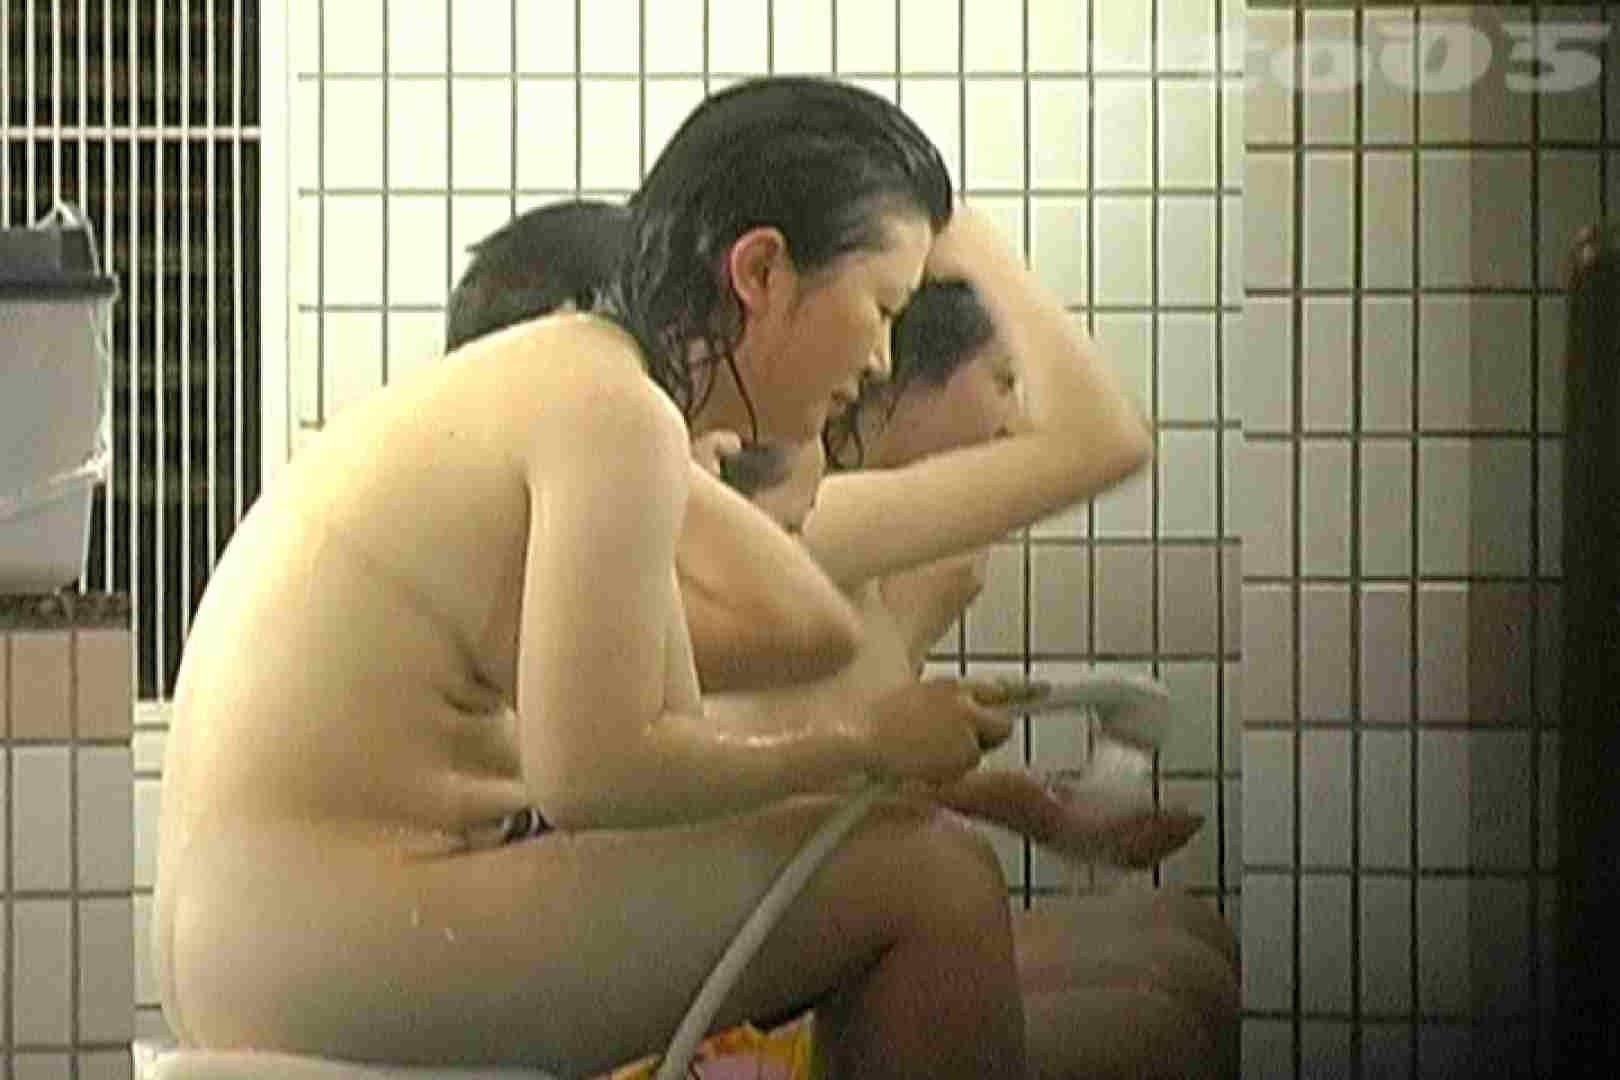 ▲復活限定▲合宿ホテル女風呂盗撮 Vol.27 女風呂  87pic 48